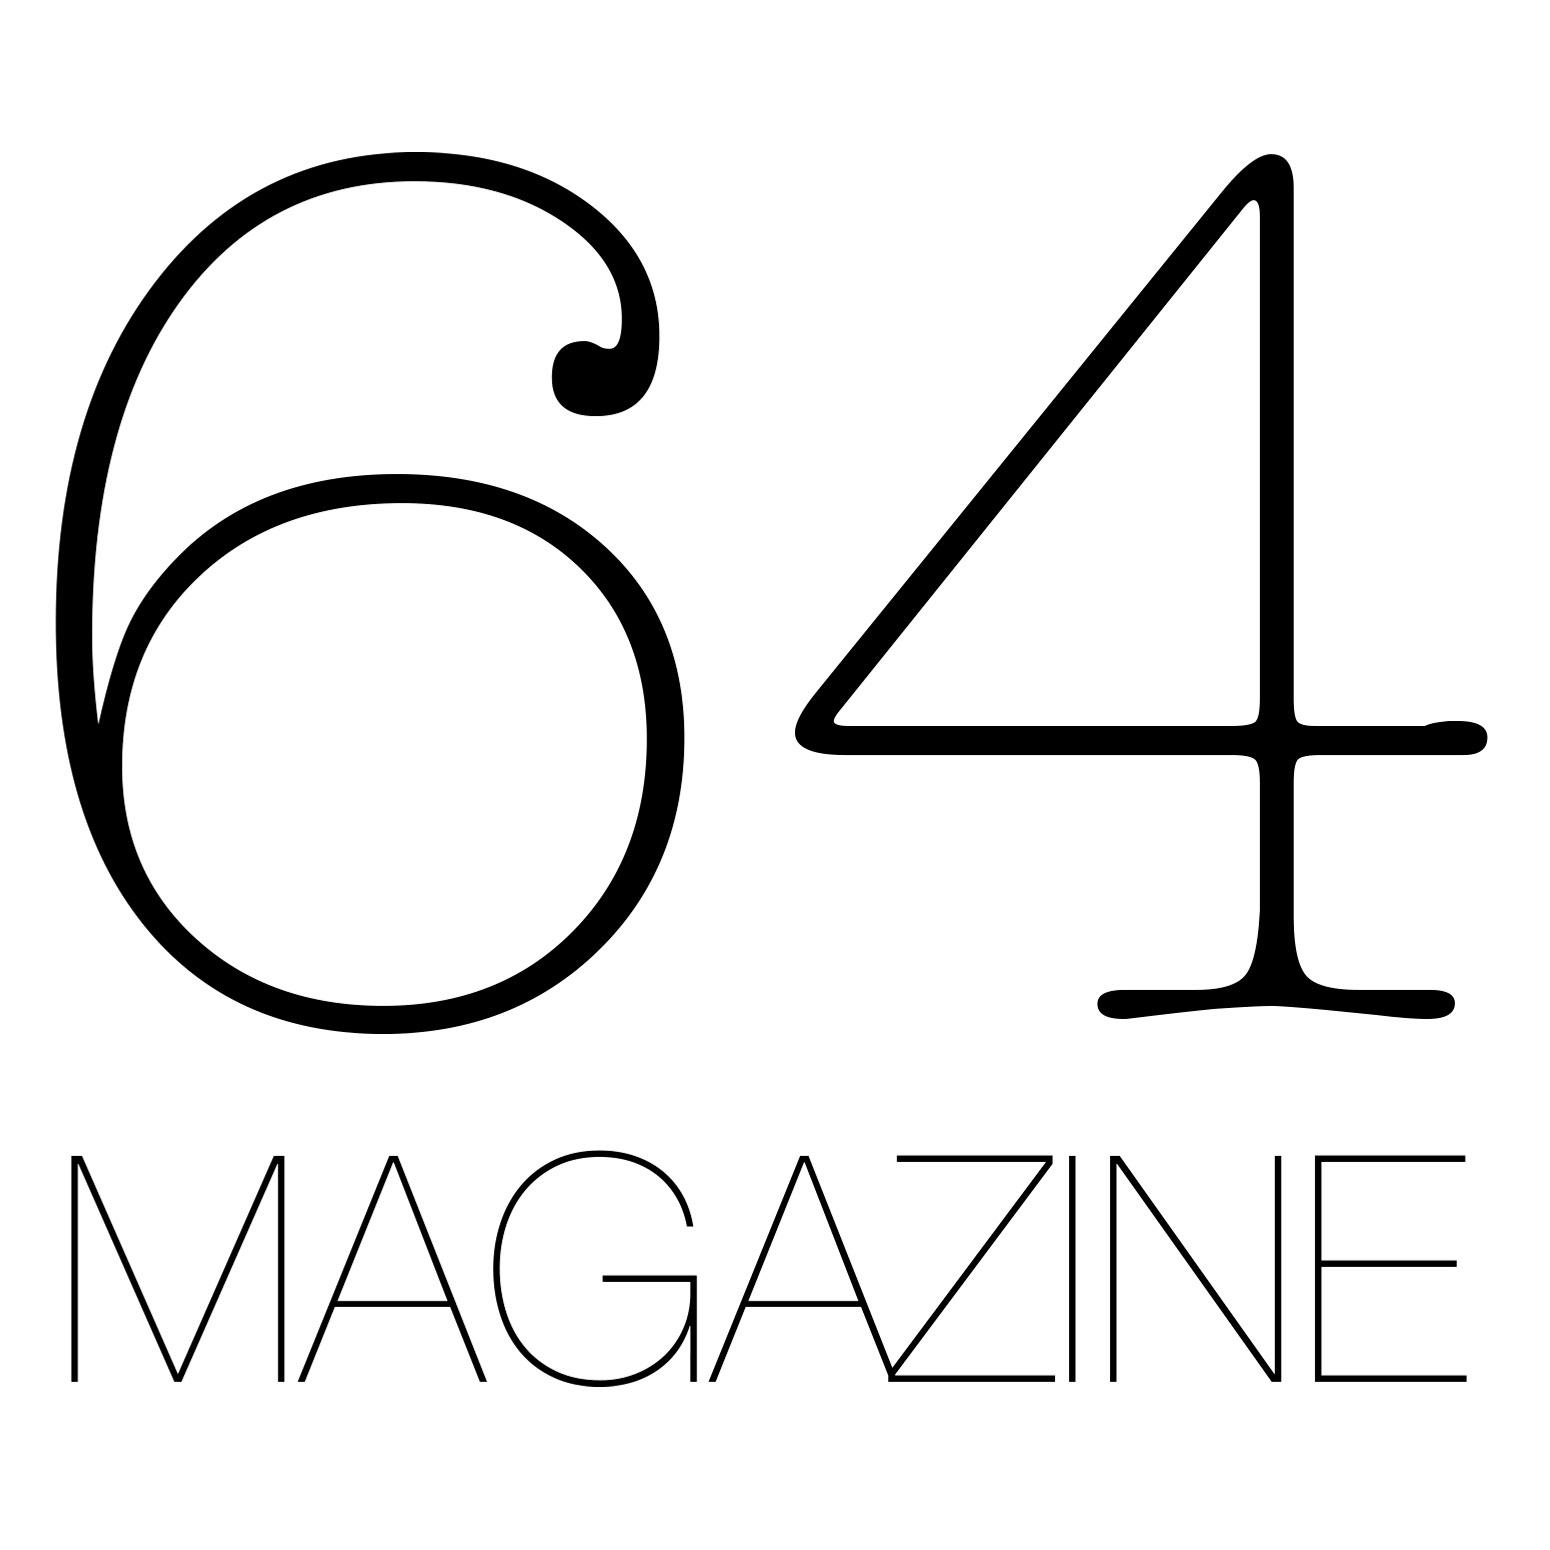 64 Magazine